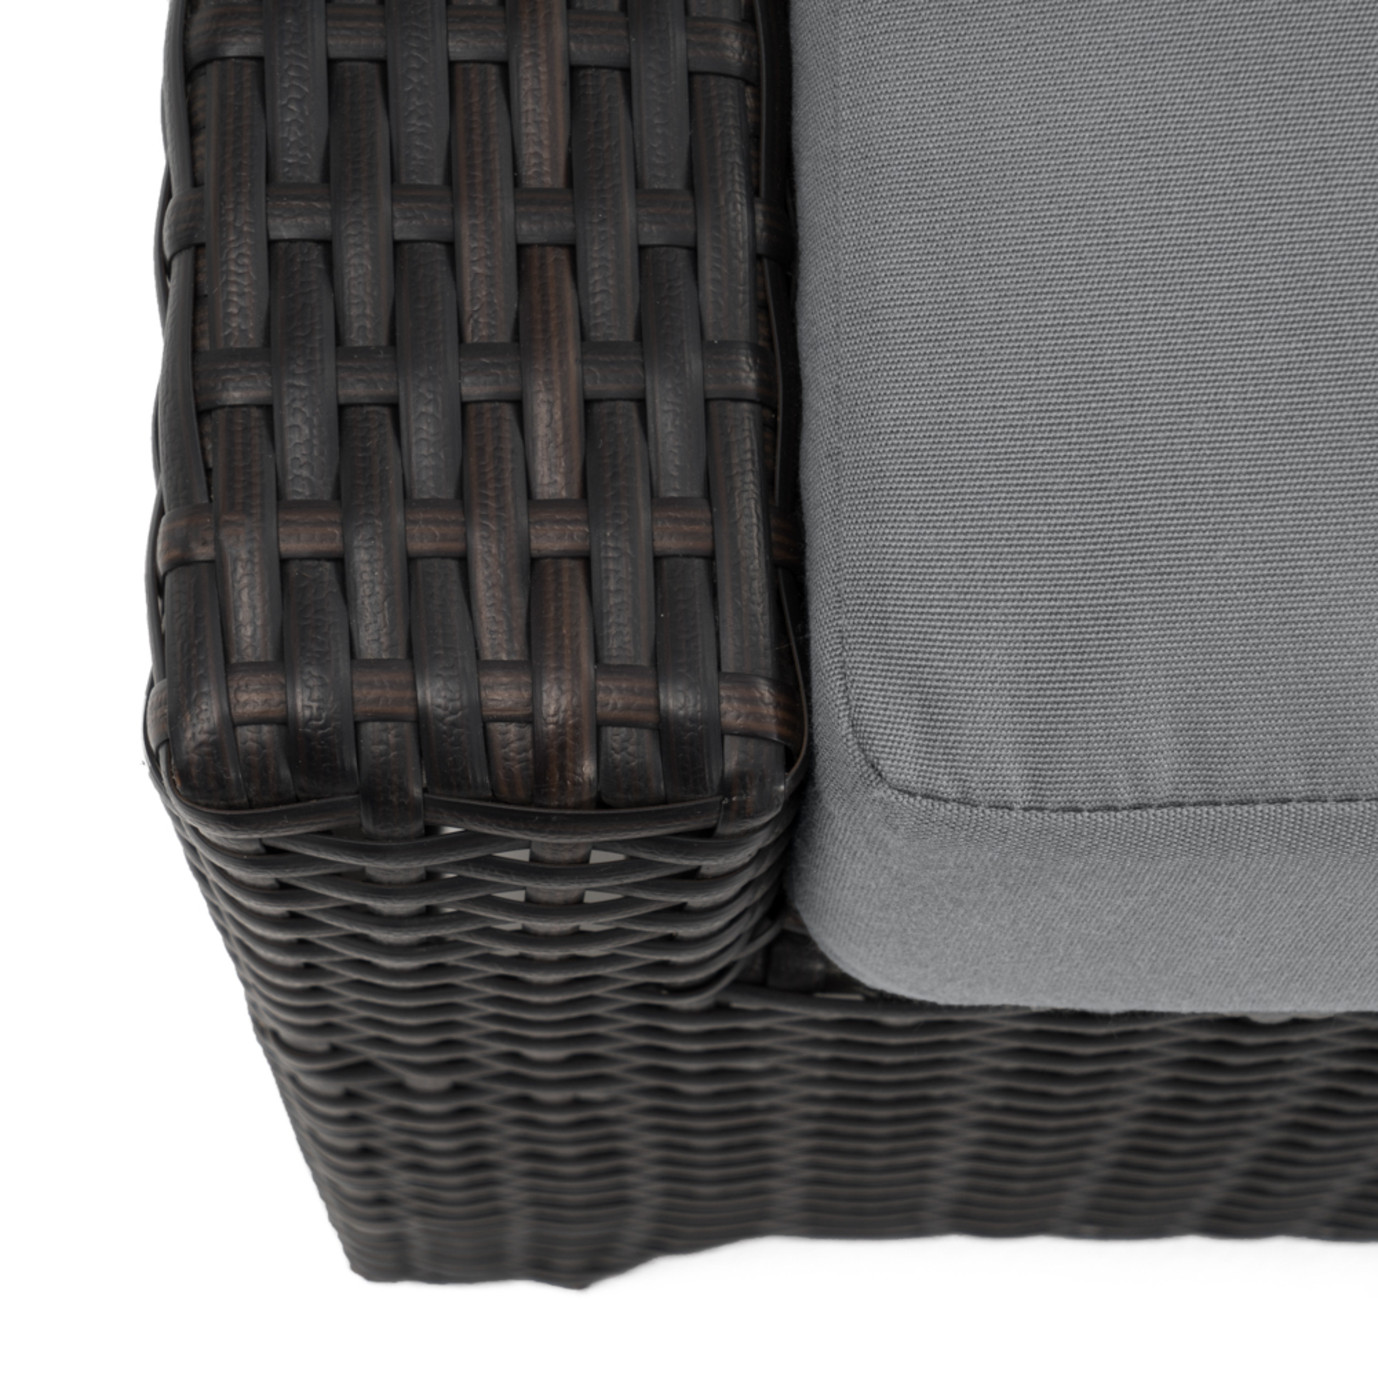 Deco™ Club Ottomans - Charcoal Gray